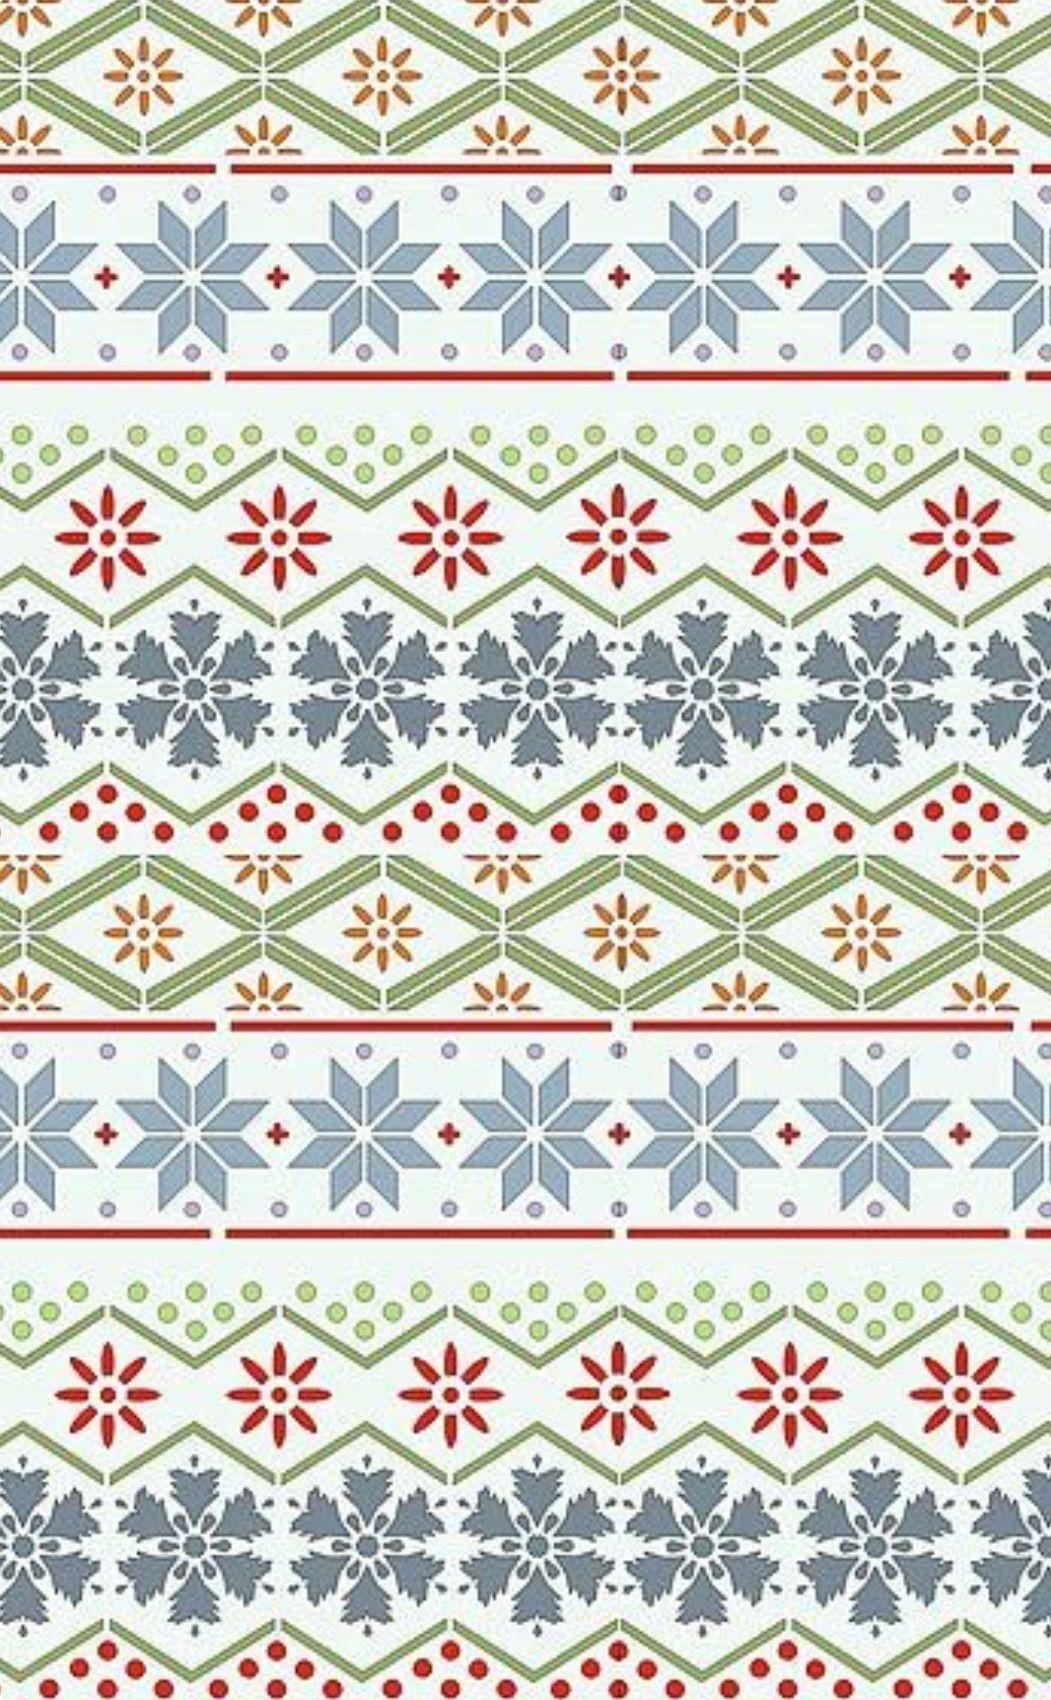 Knitting Wallpaper Iphone : Pin by heather ann on seasons marshmallow pinterest